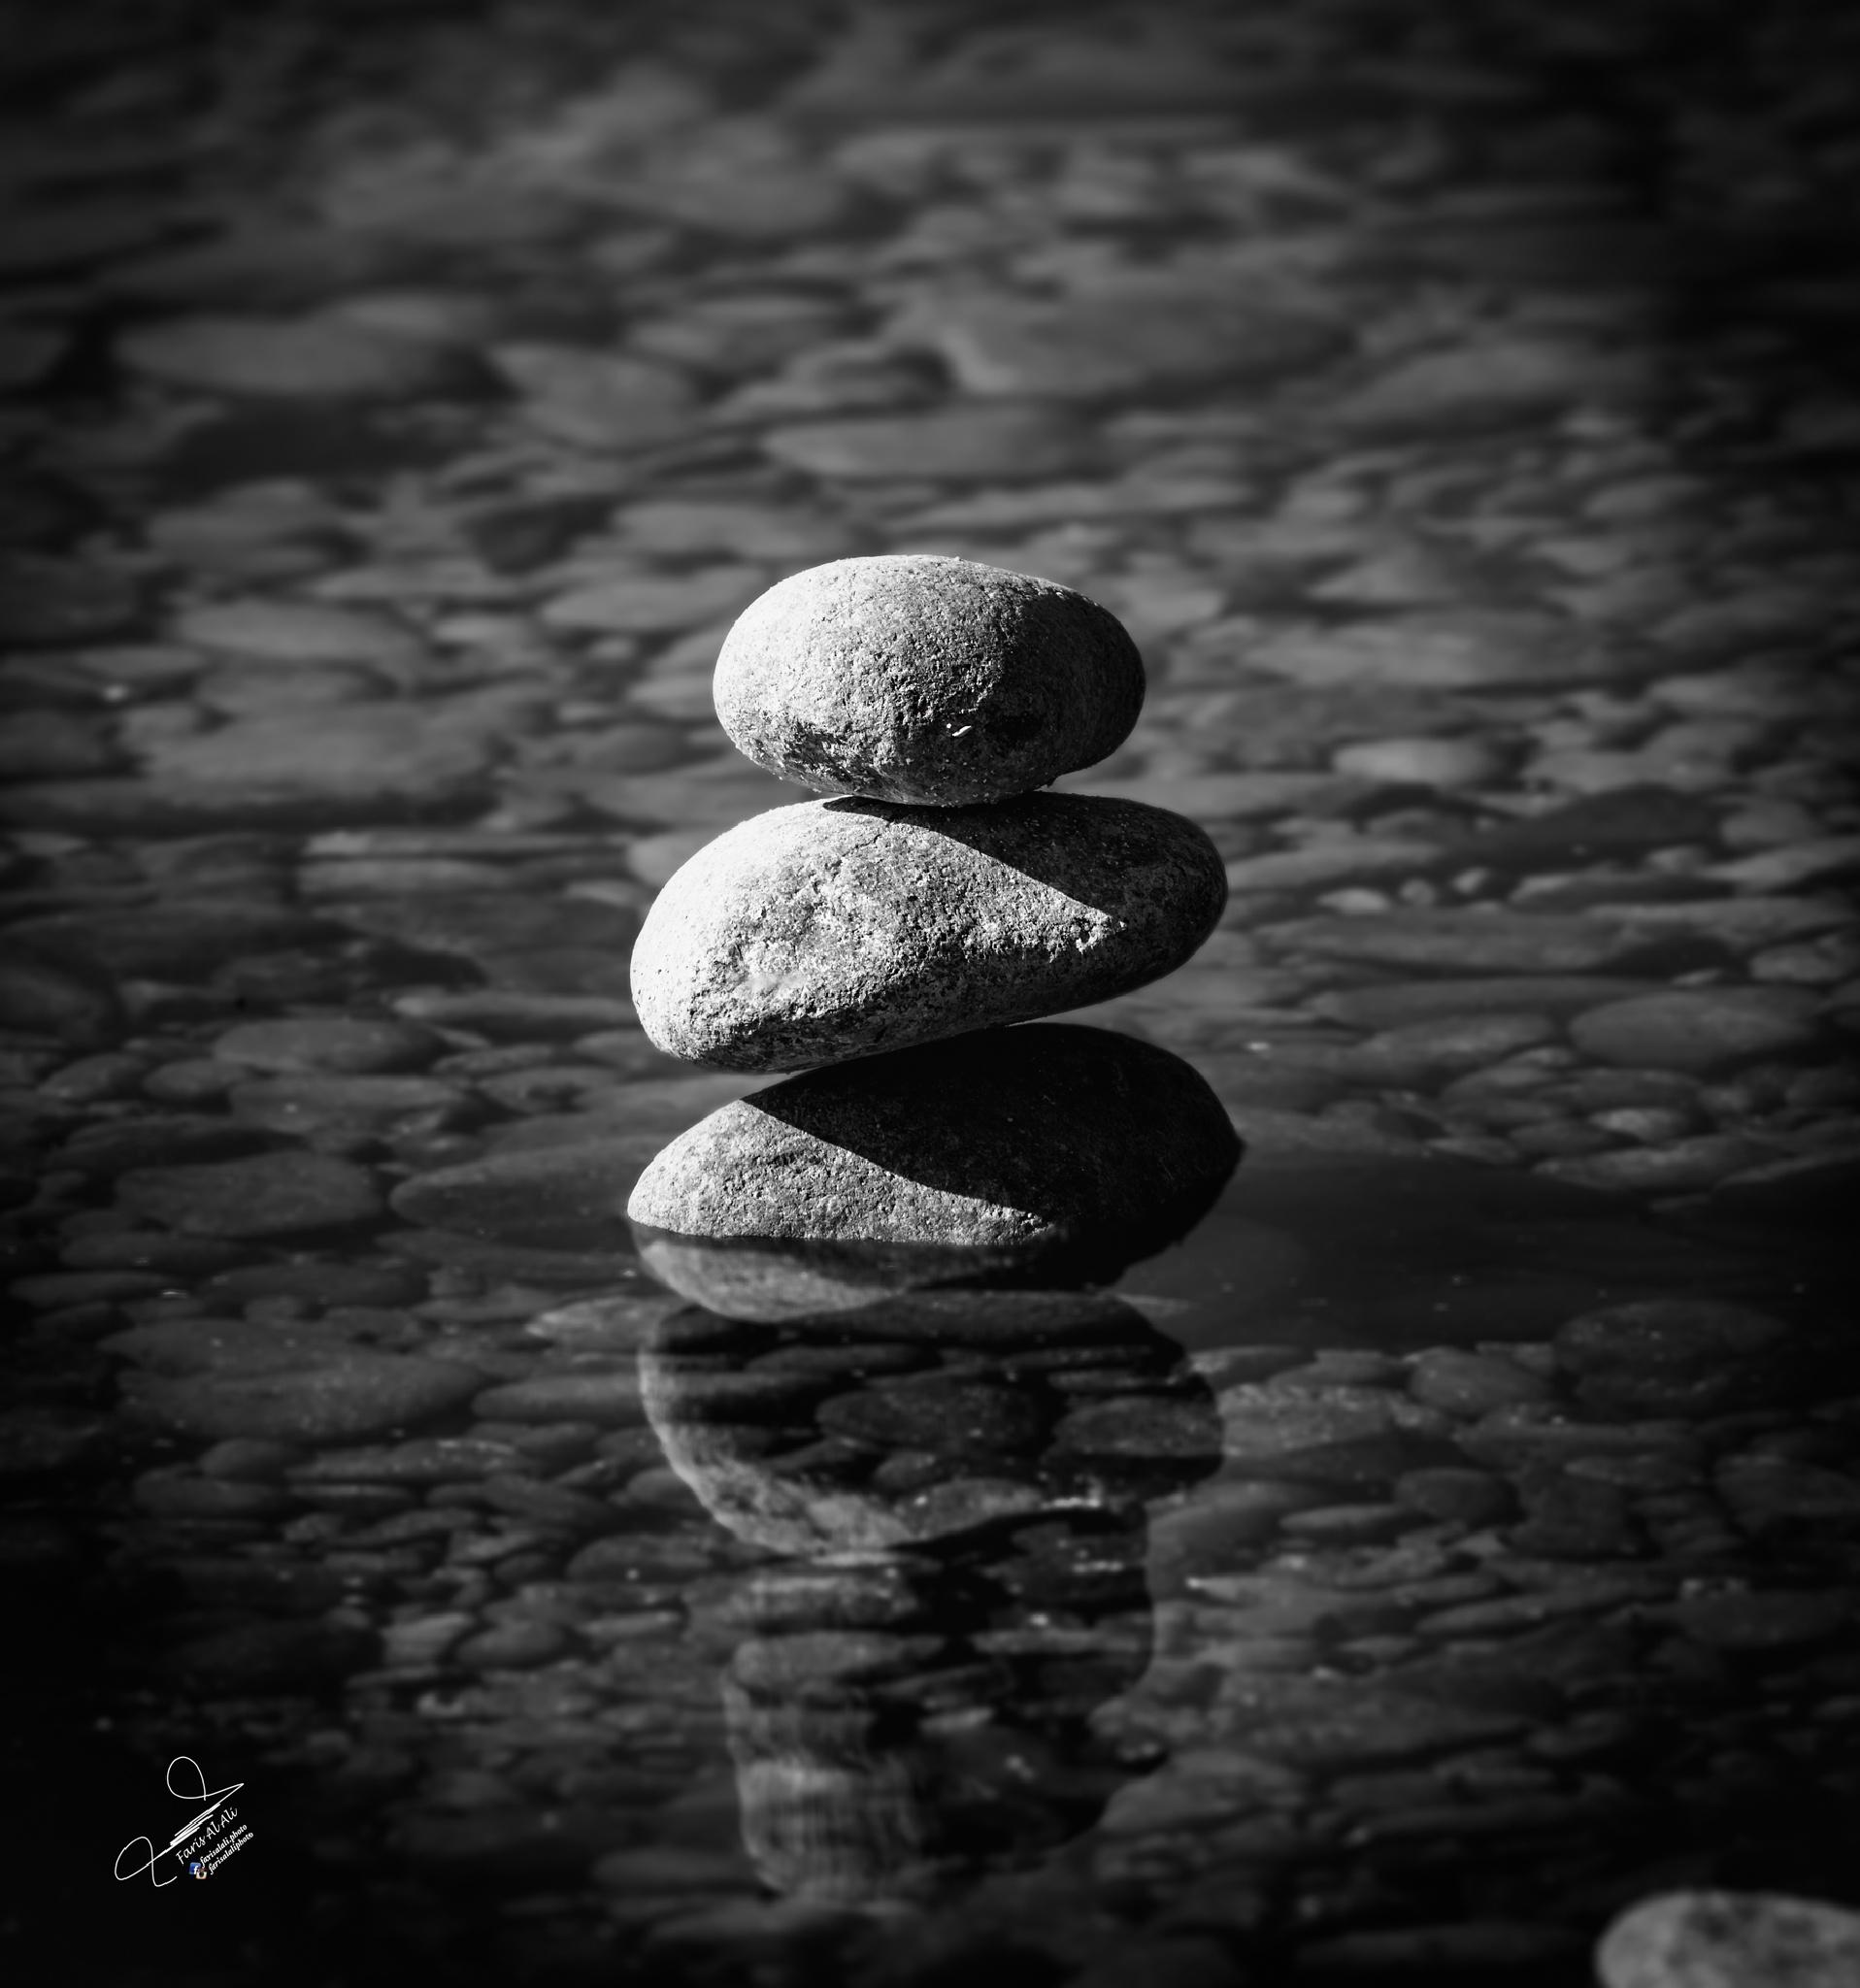 Black & White Photography by farisalali.photo